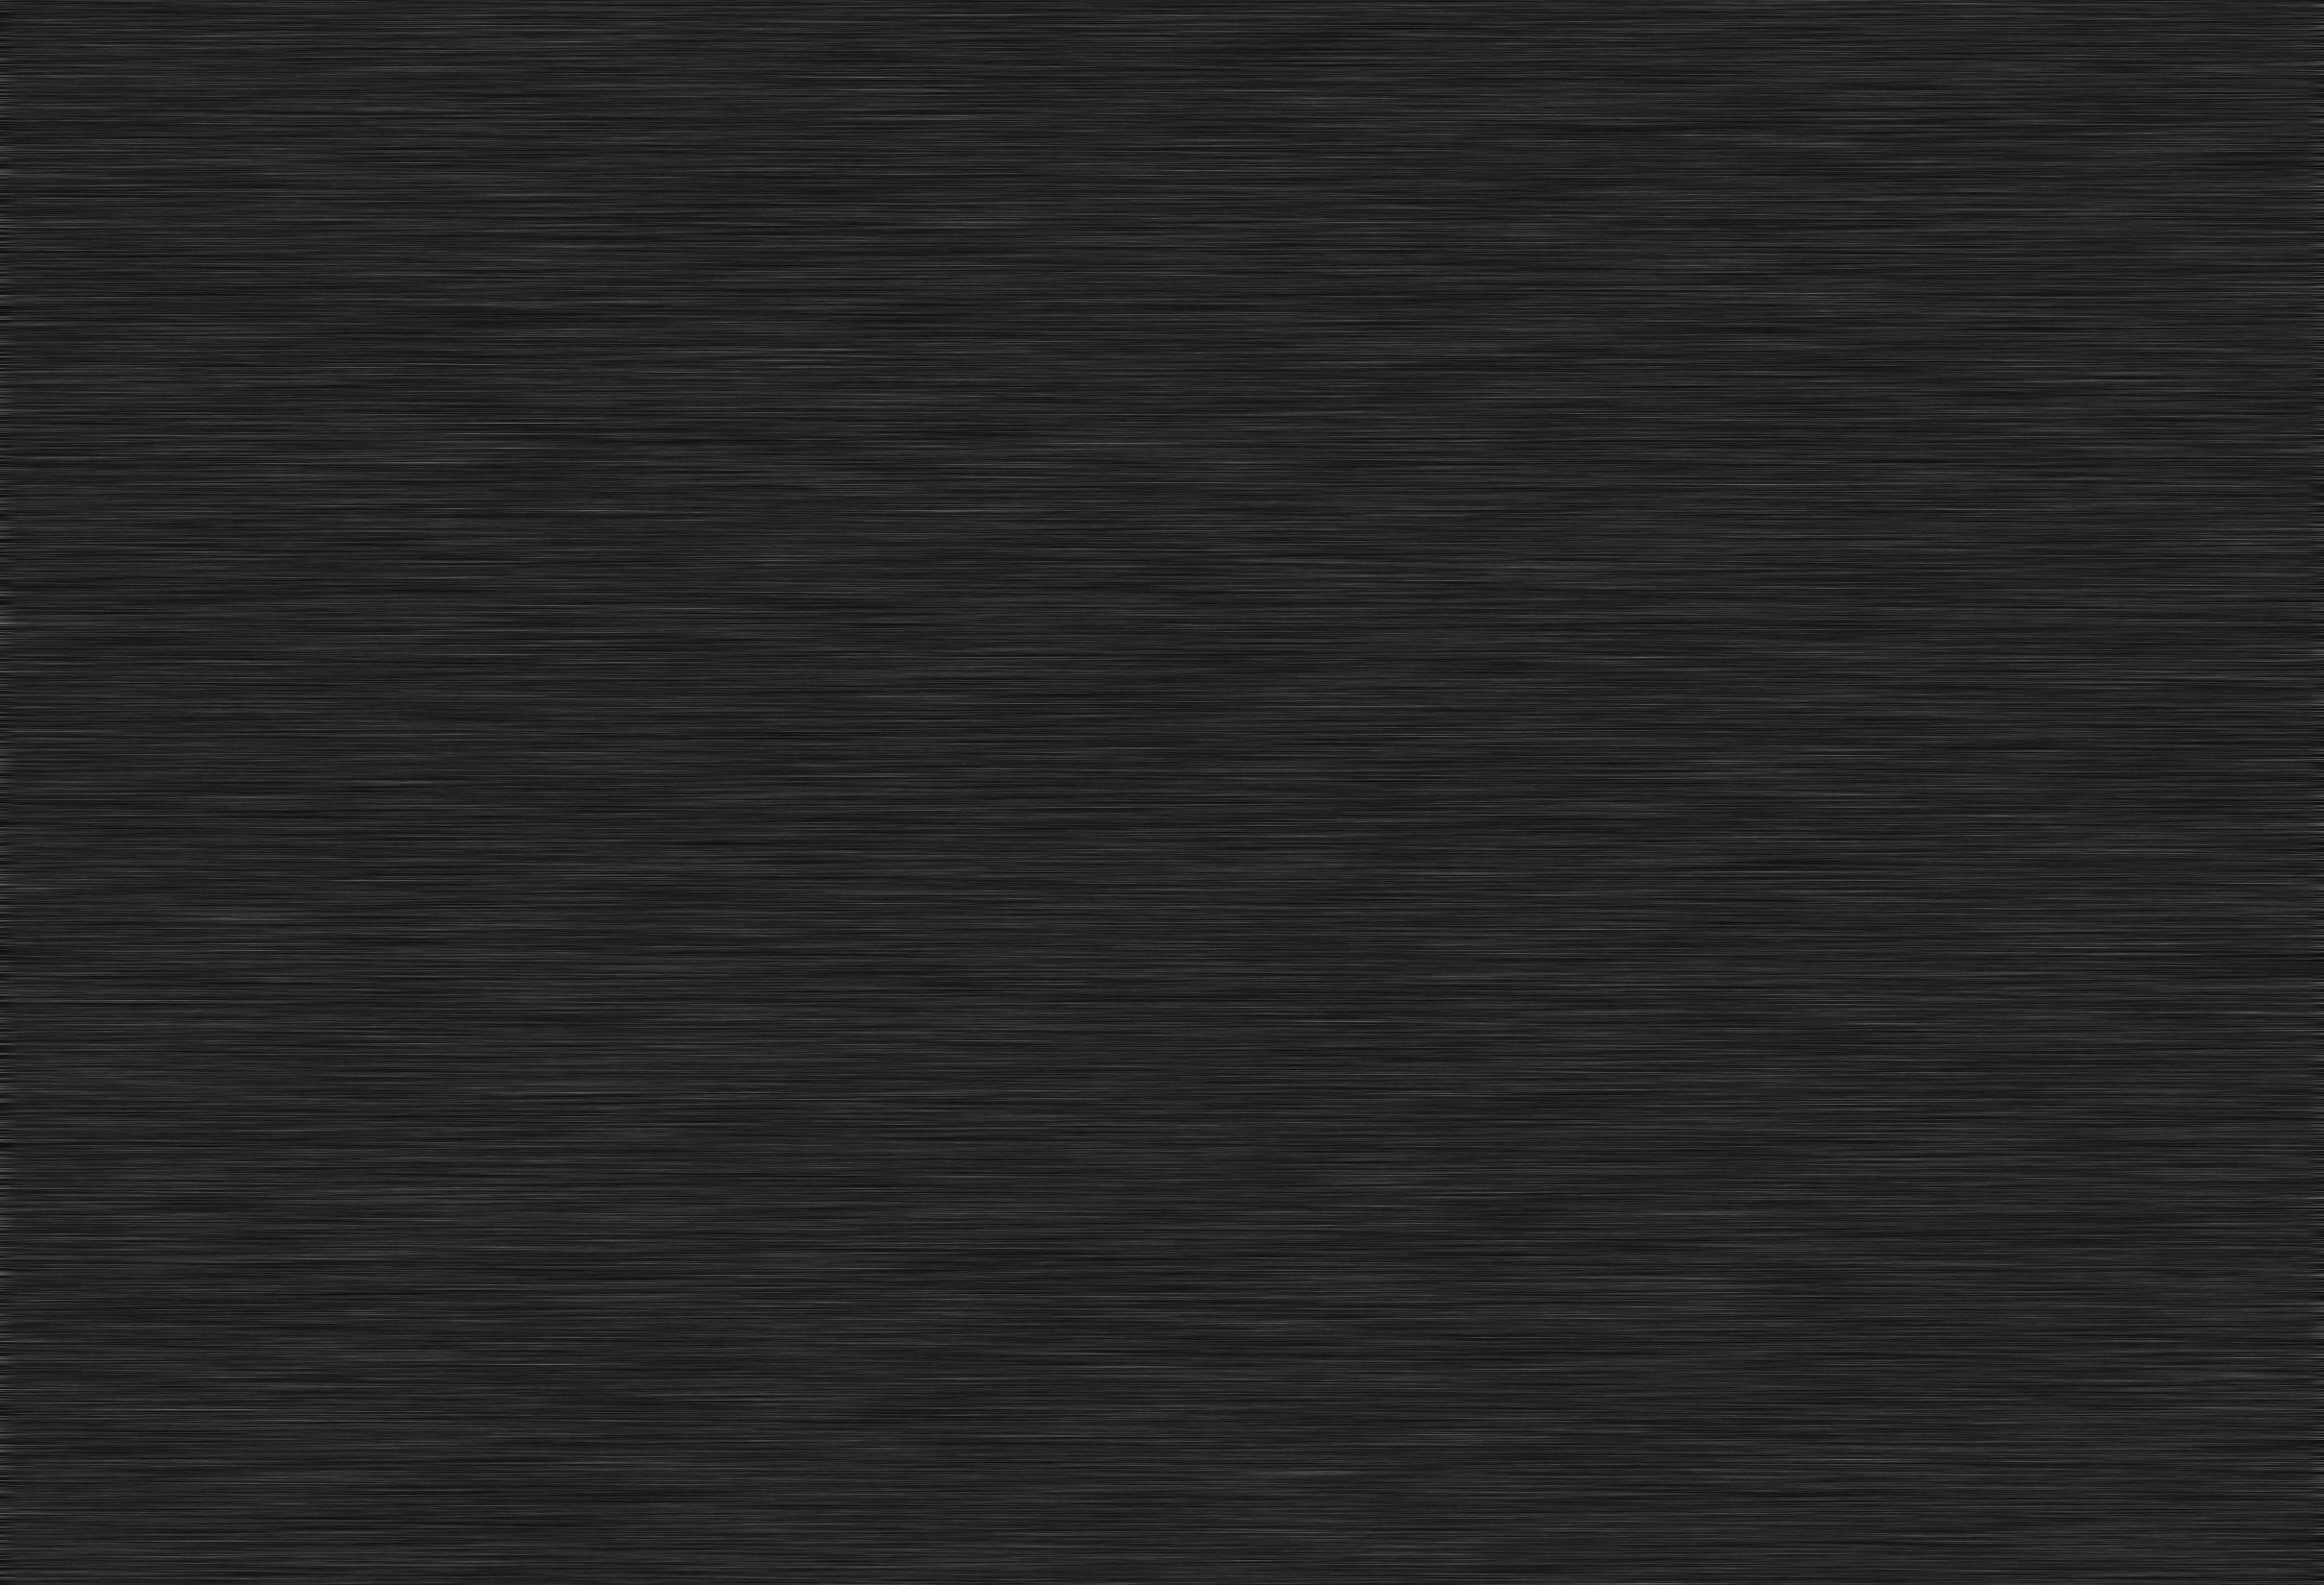 black metal texture. Black Metal Texture By Yourpoisontheo